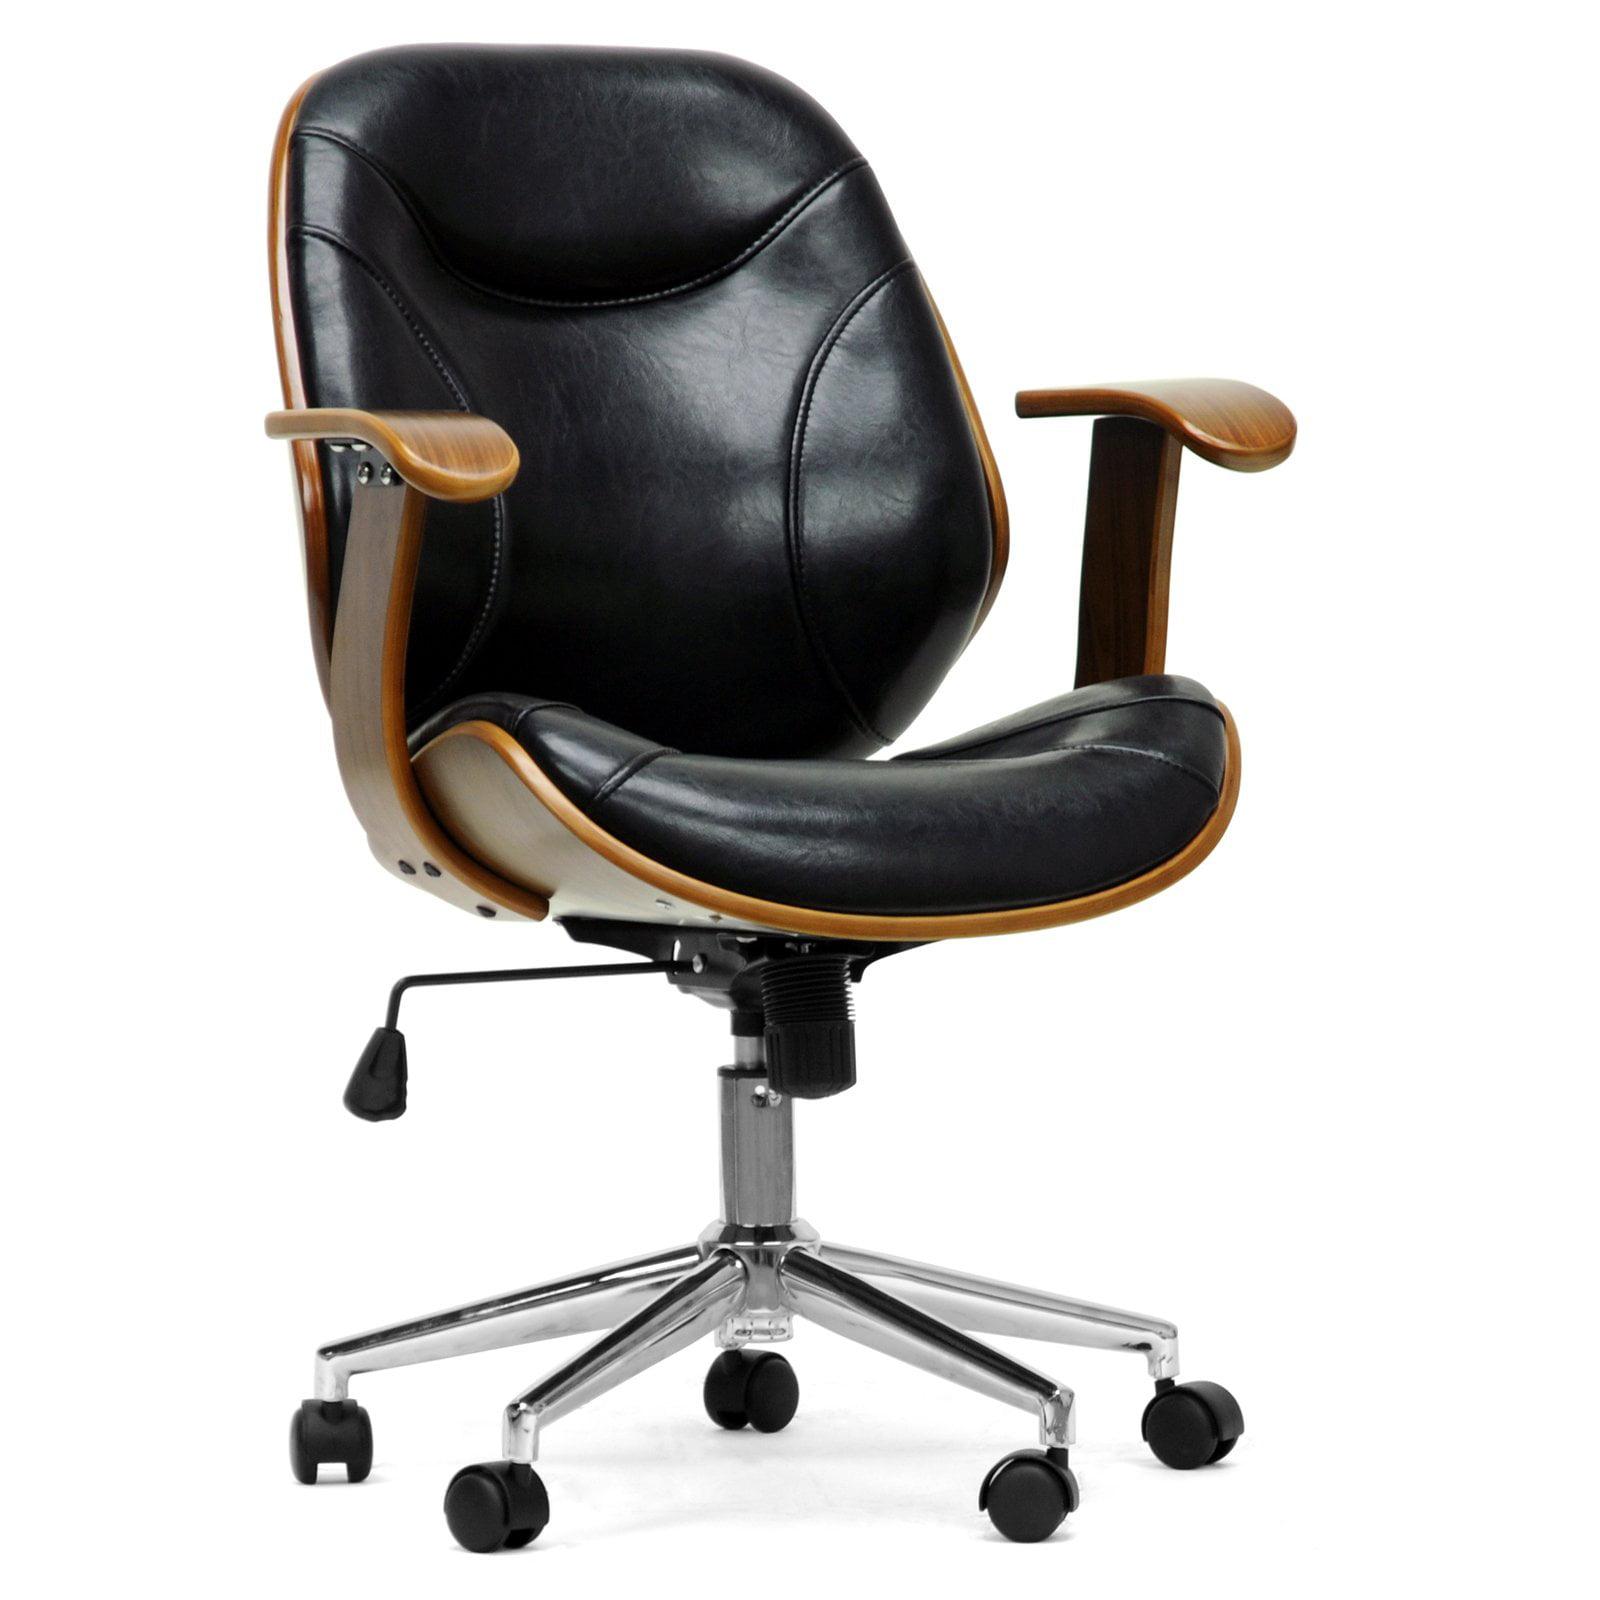 Swell Baxton Studio Rathburn Modern Office Chair Walnut Black Home Interior And Landscaping Palasignezvosmurscom